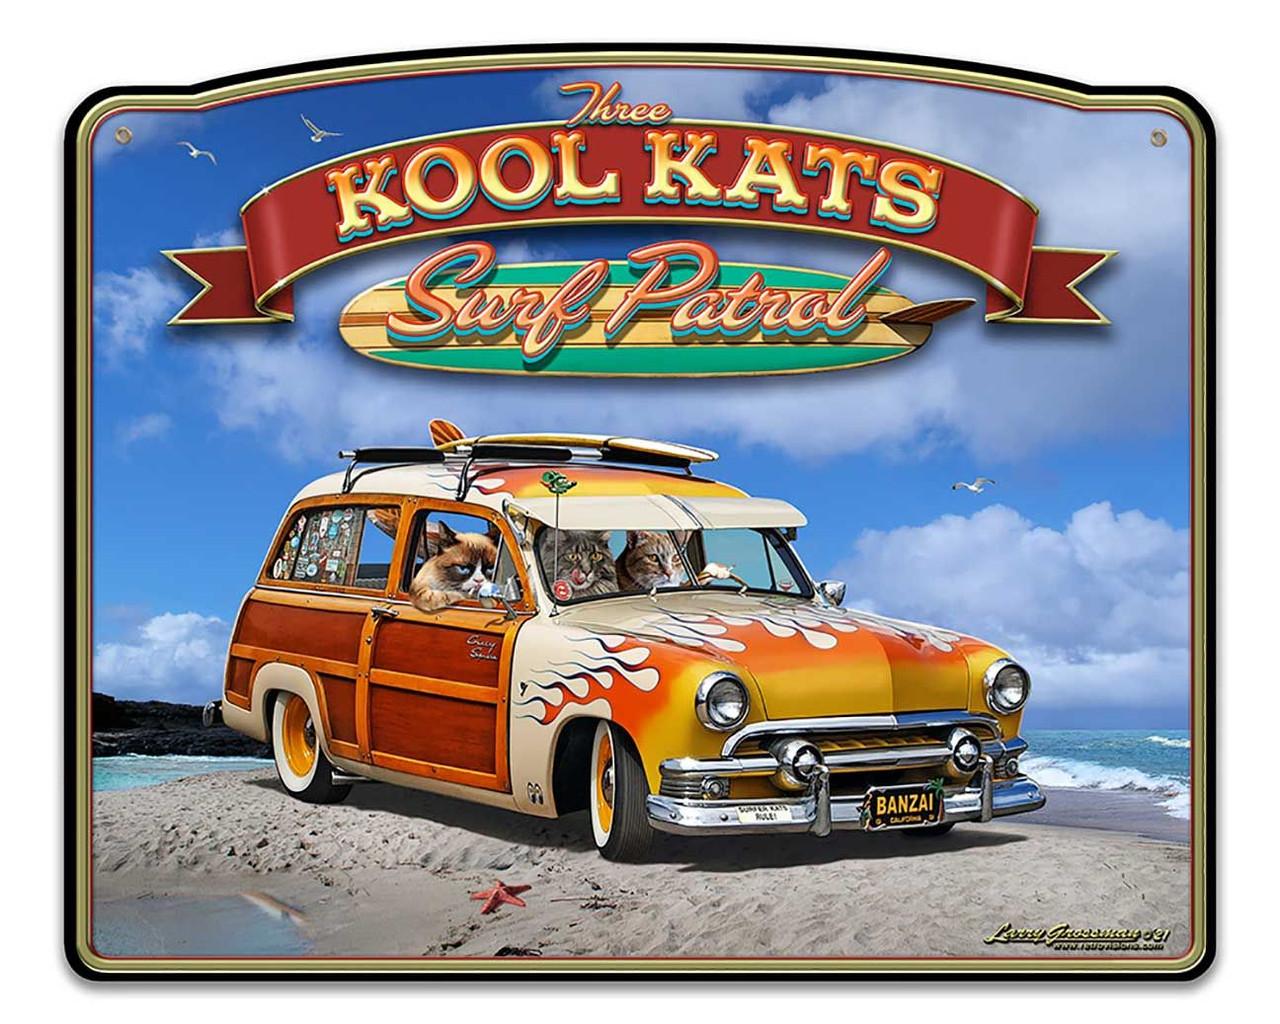 3 Kool Kats Custom Shape Metal Sign 18 x 15 Inches